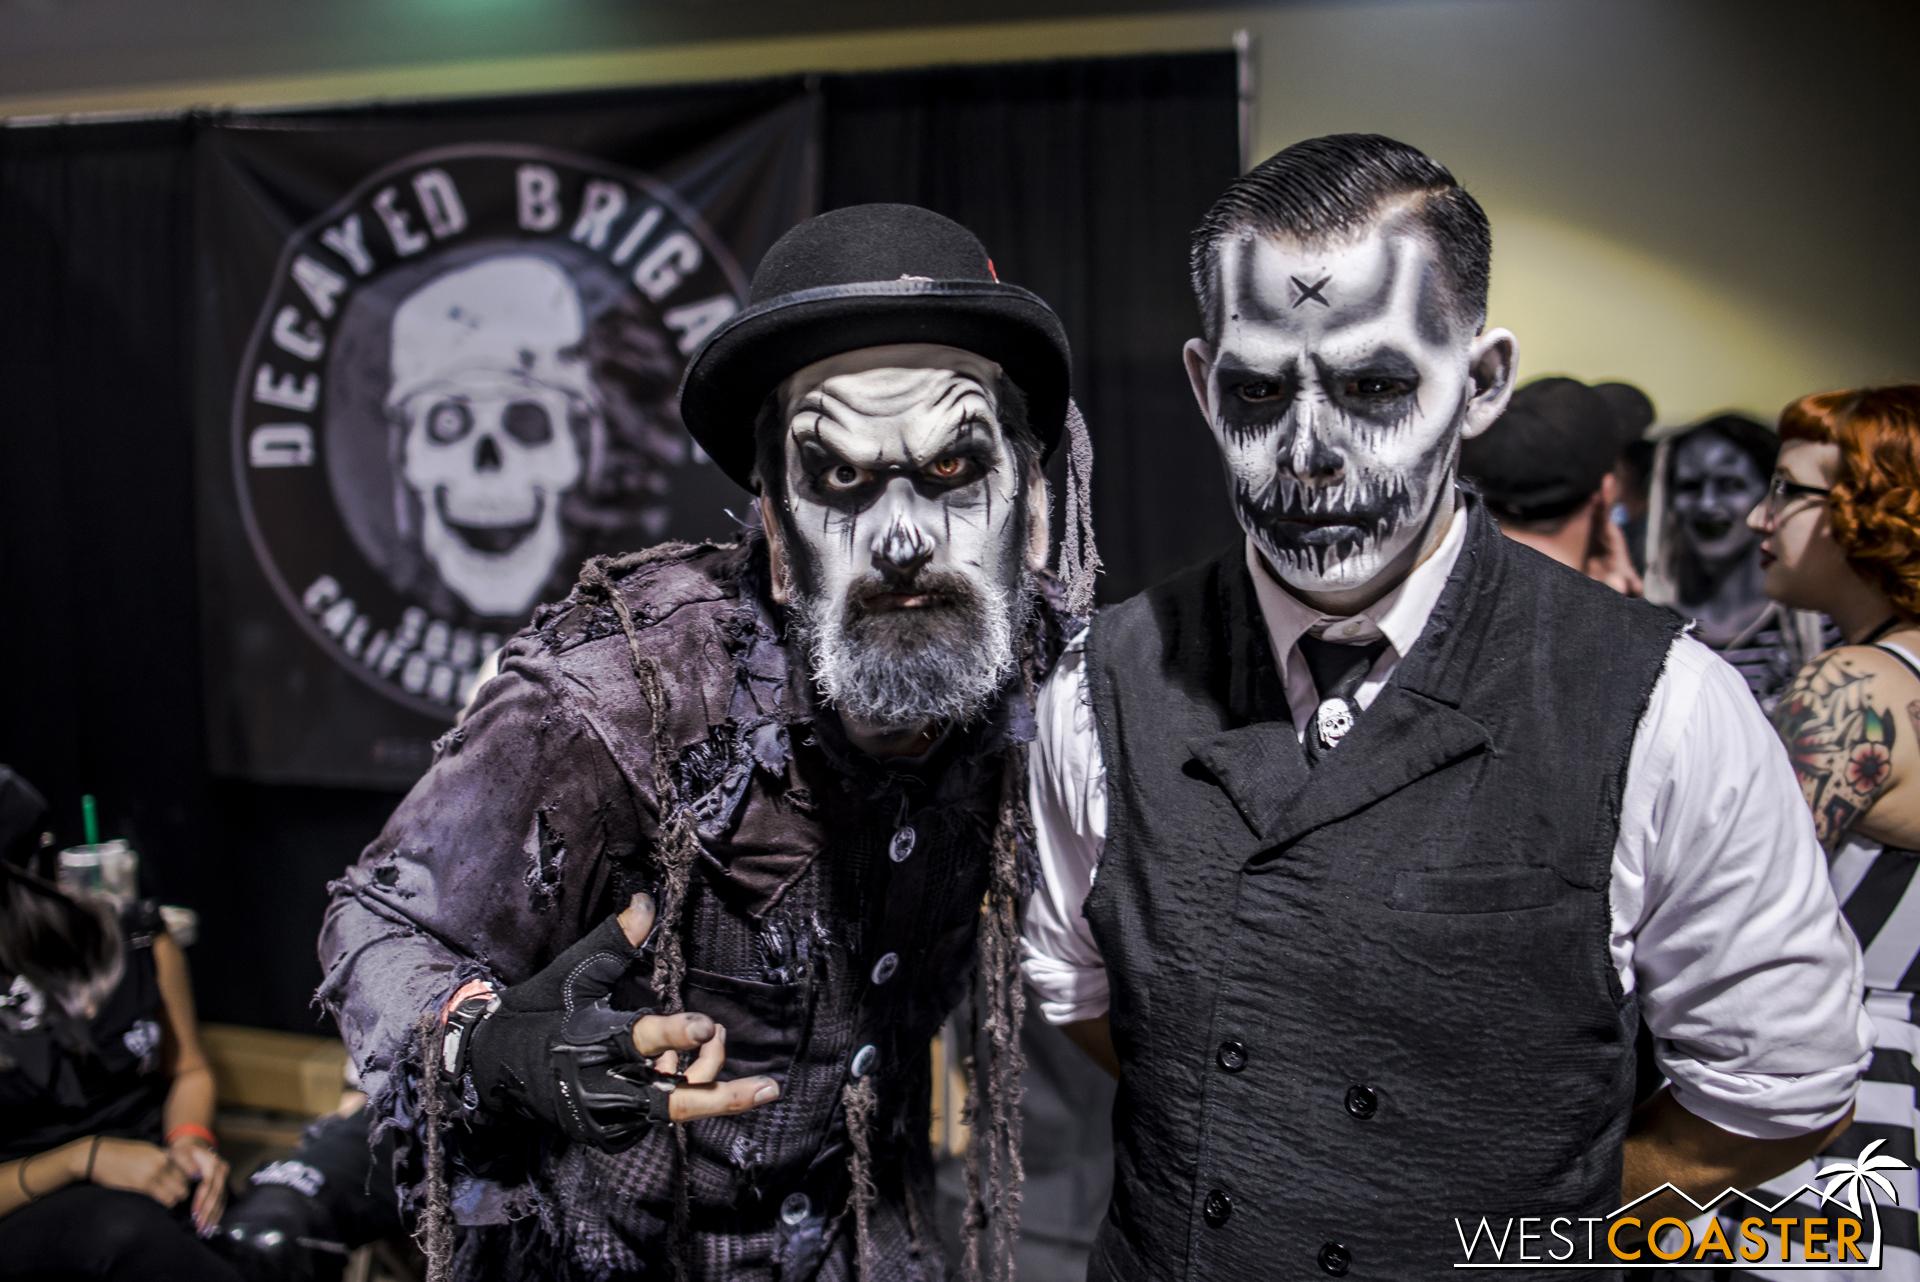 Eerie and Sin make a menacing duo.